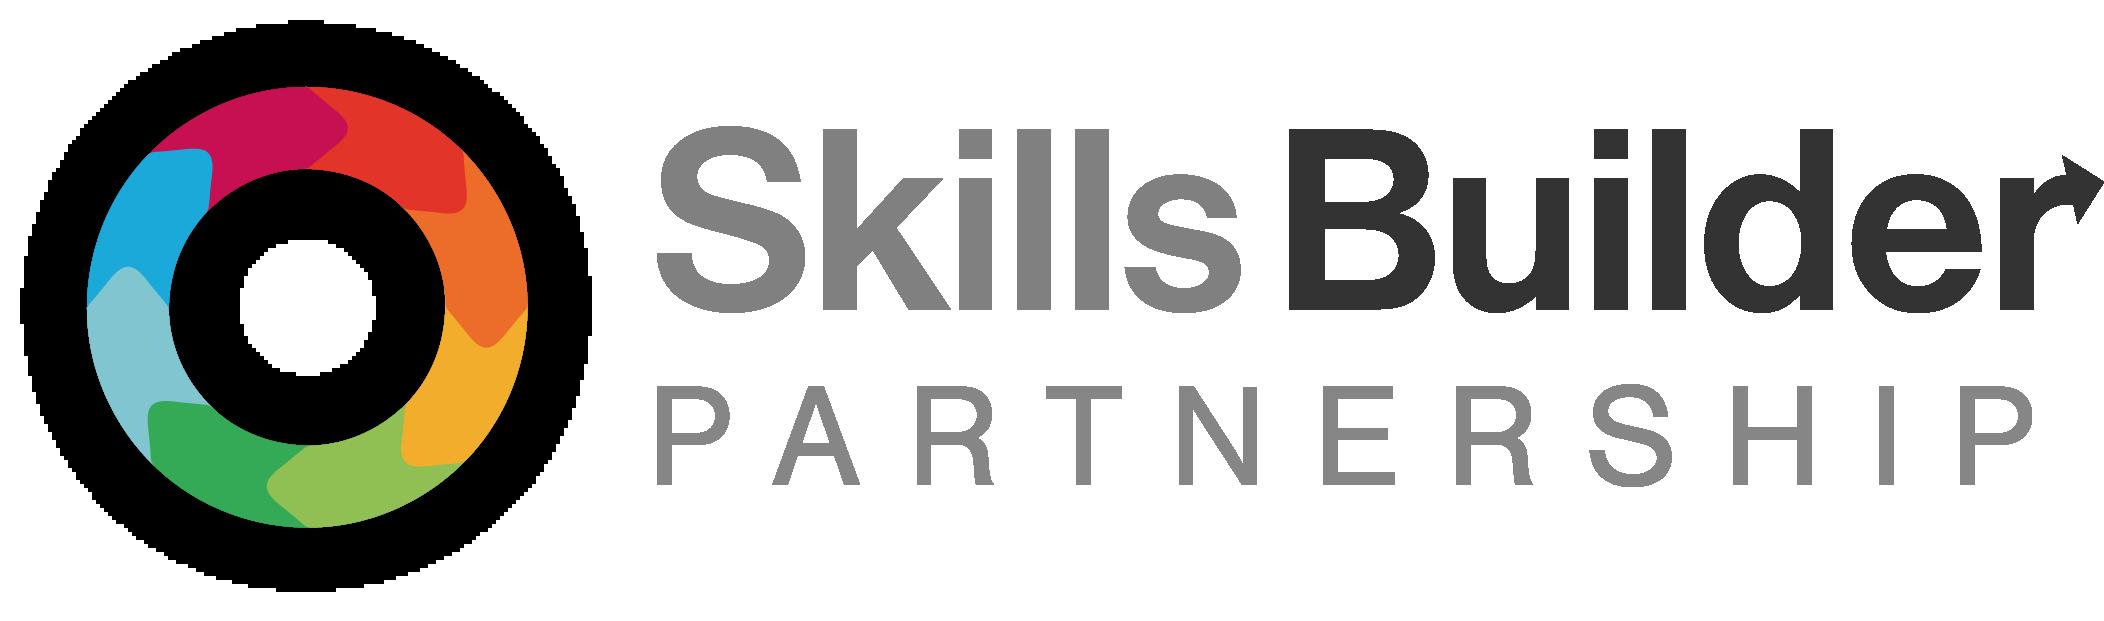 Skills Builder Partnership Logo